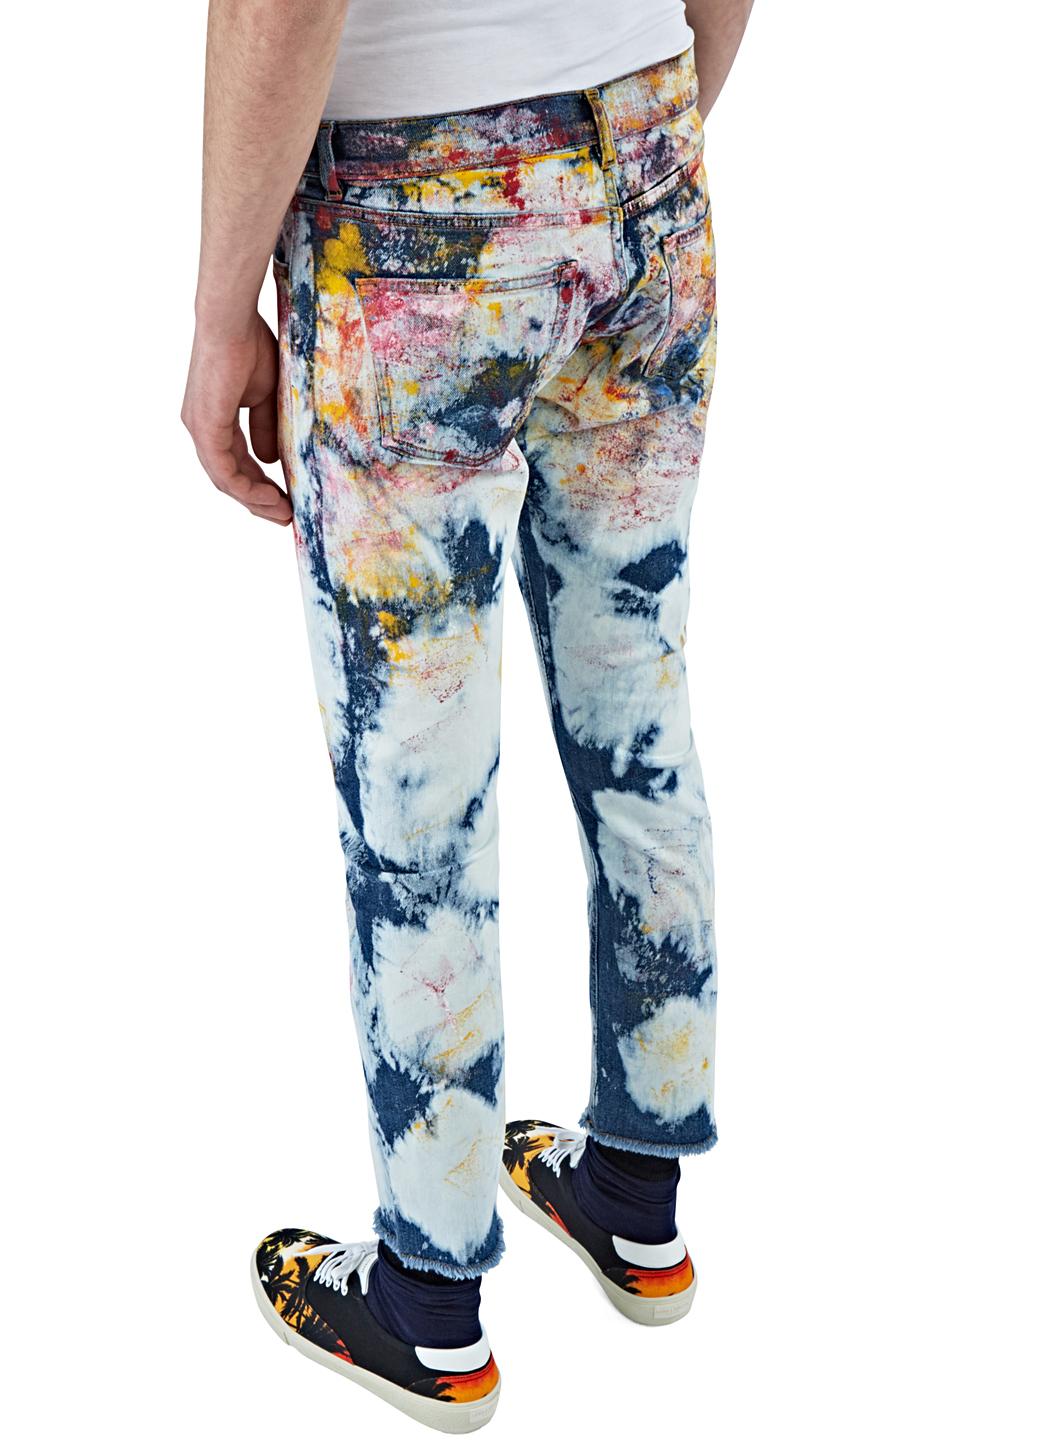 James Long Denim Men's Slim Tie-dye Painted Jeans In Multicolour in Blue for Men